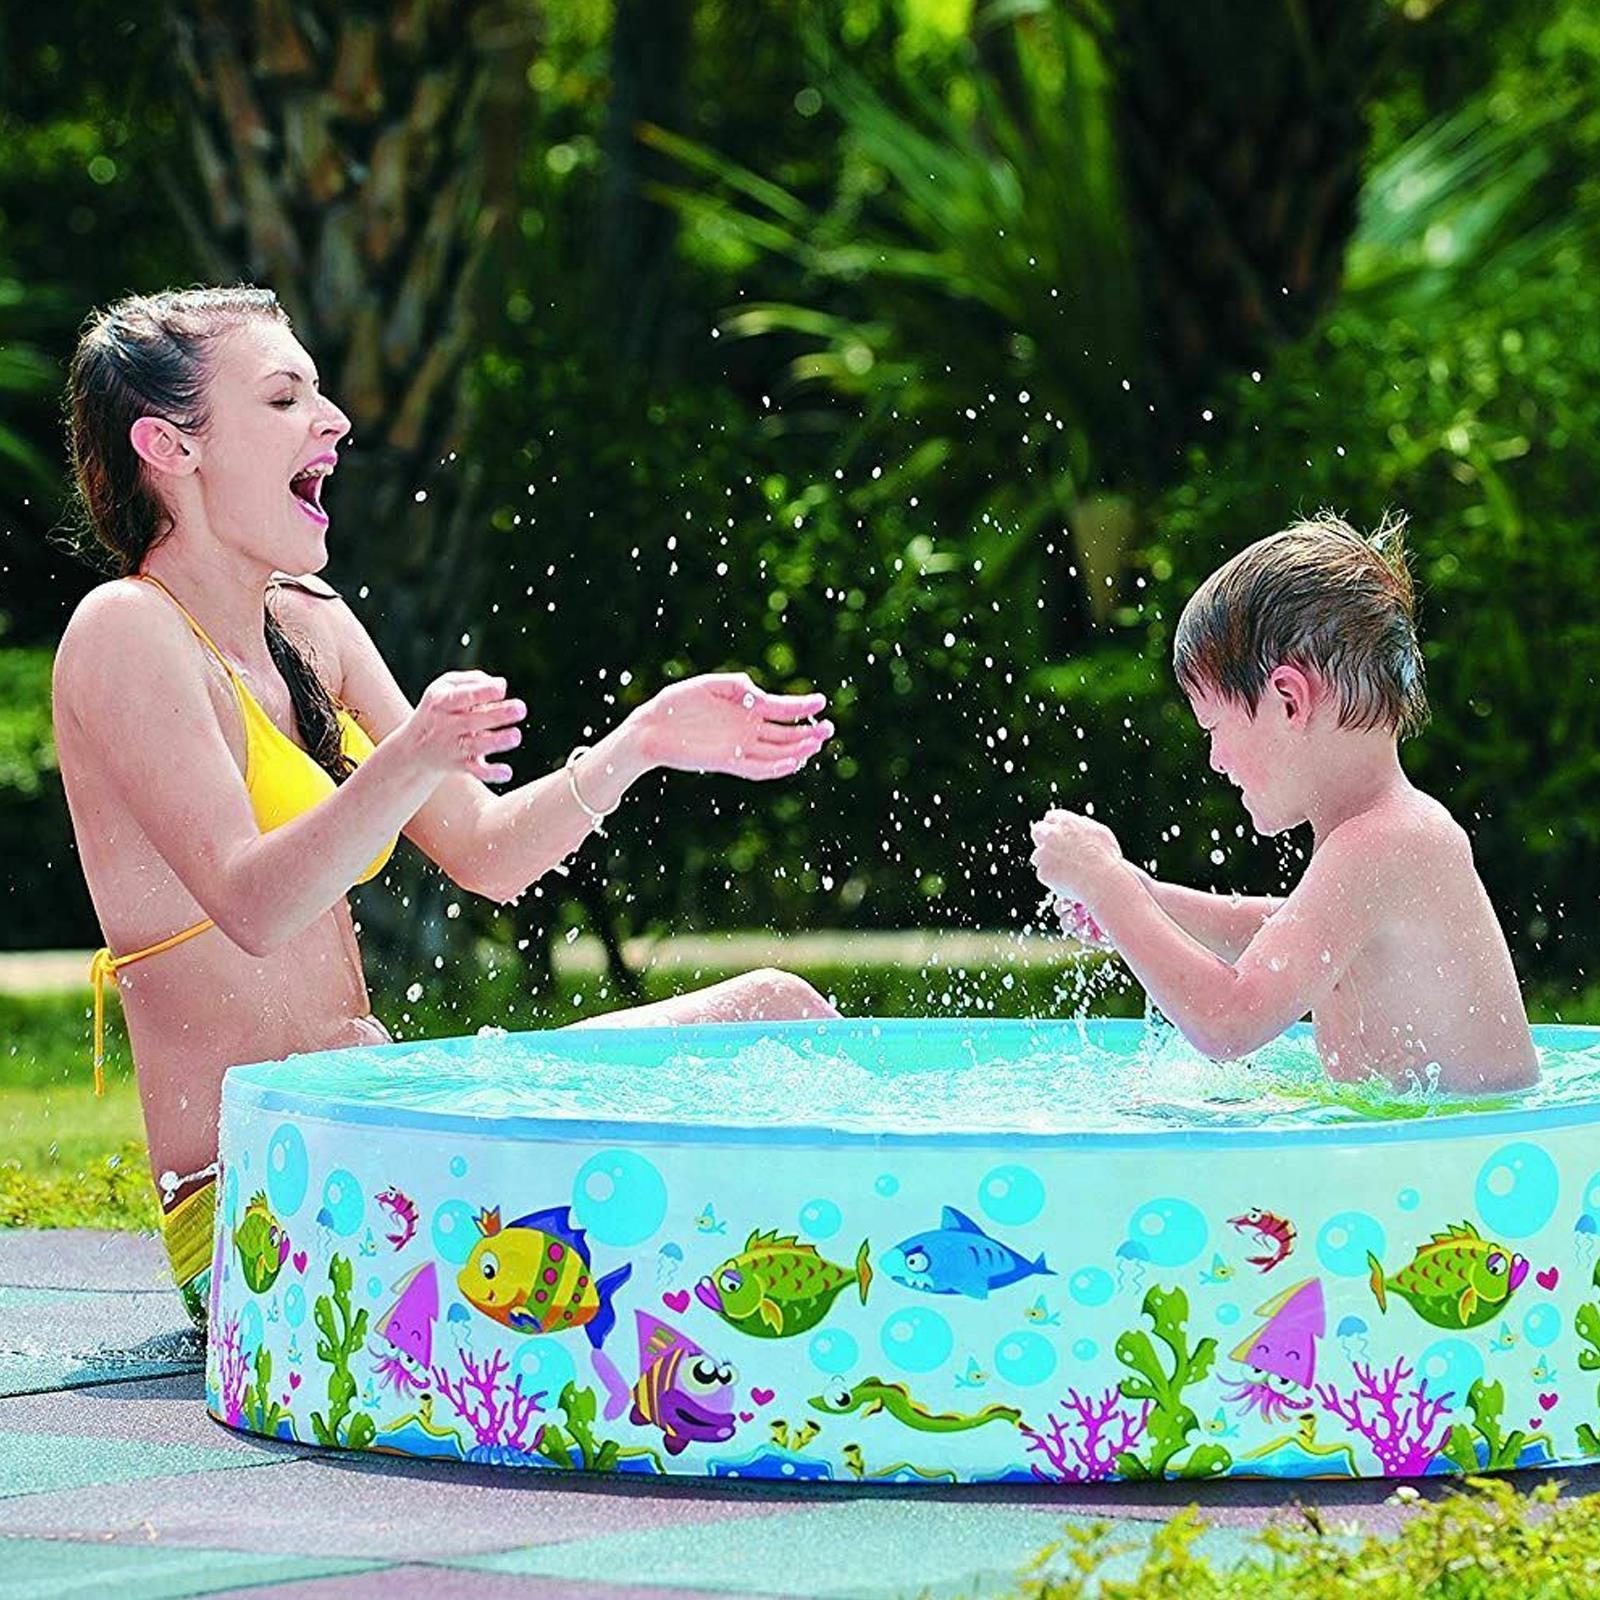 Centro-De-Juegos-De-Natacion-Ninos-Ridgid-Pared-piscina-infantil-Mar-Vida-al-Aire-Libre-diversion miniatura 5